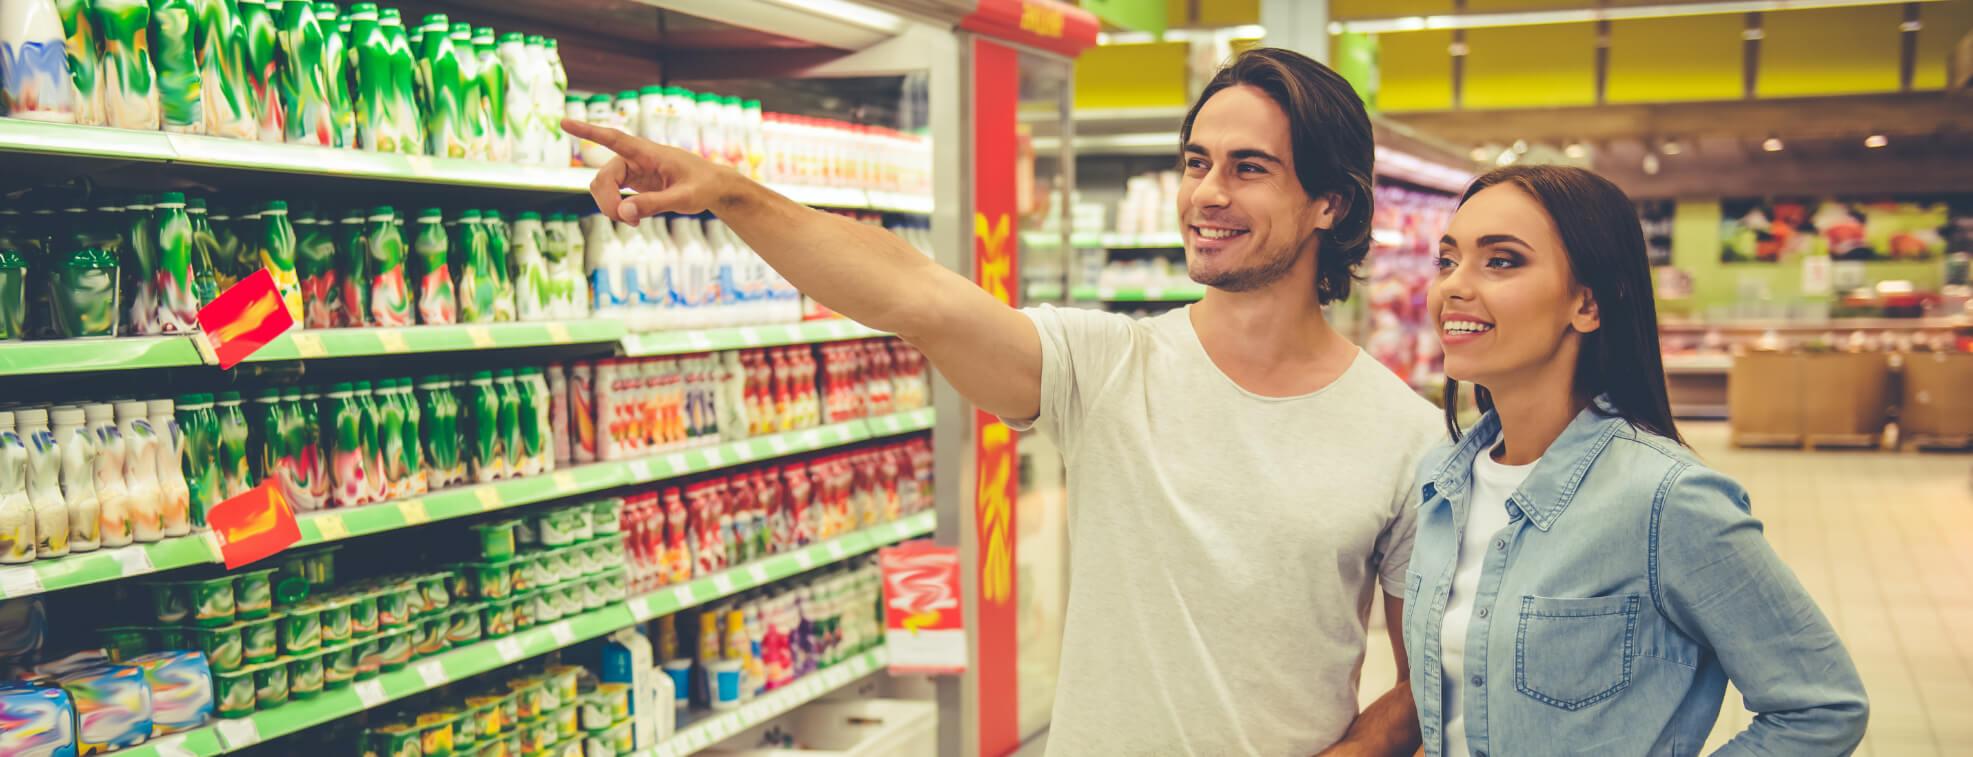 Successful Supermarket